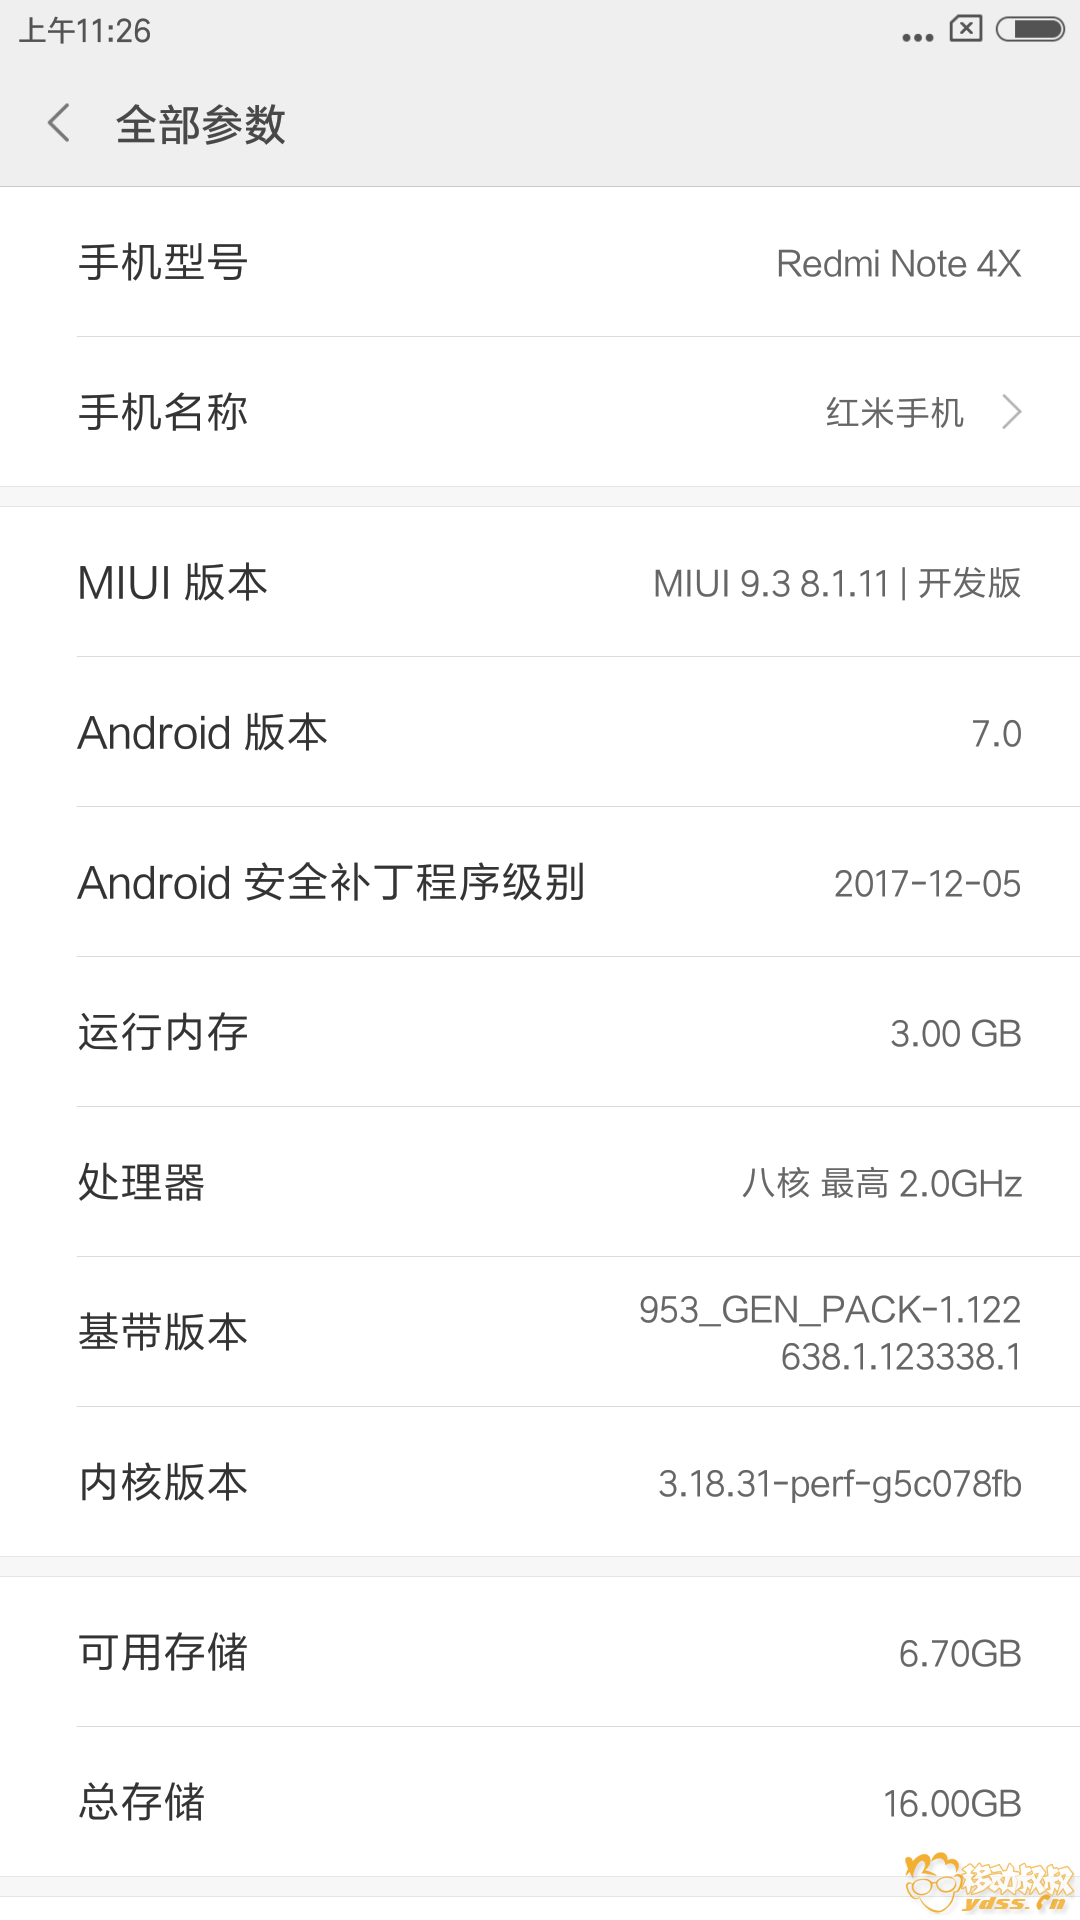 Screenshot_2018-01-11-11-26-24-904_com.android.settings.png